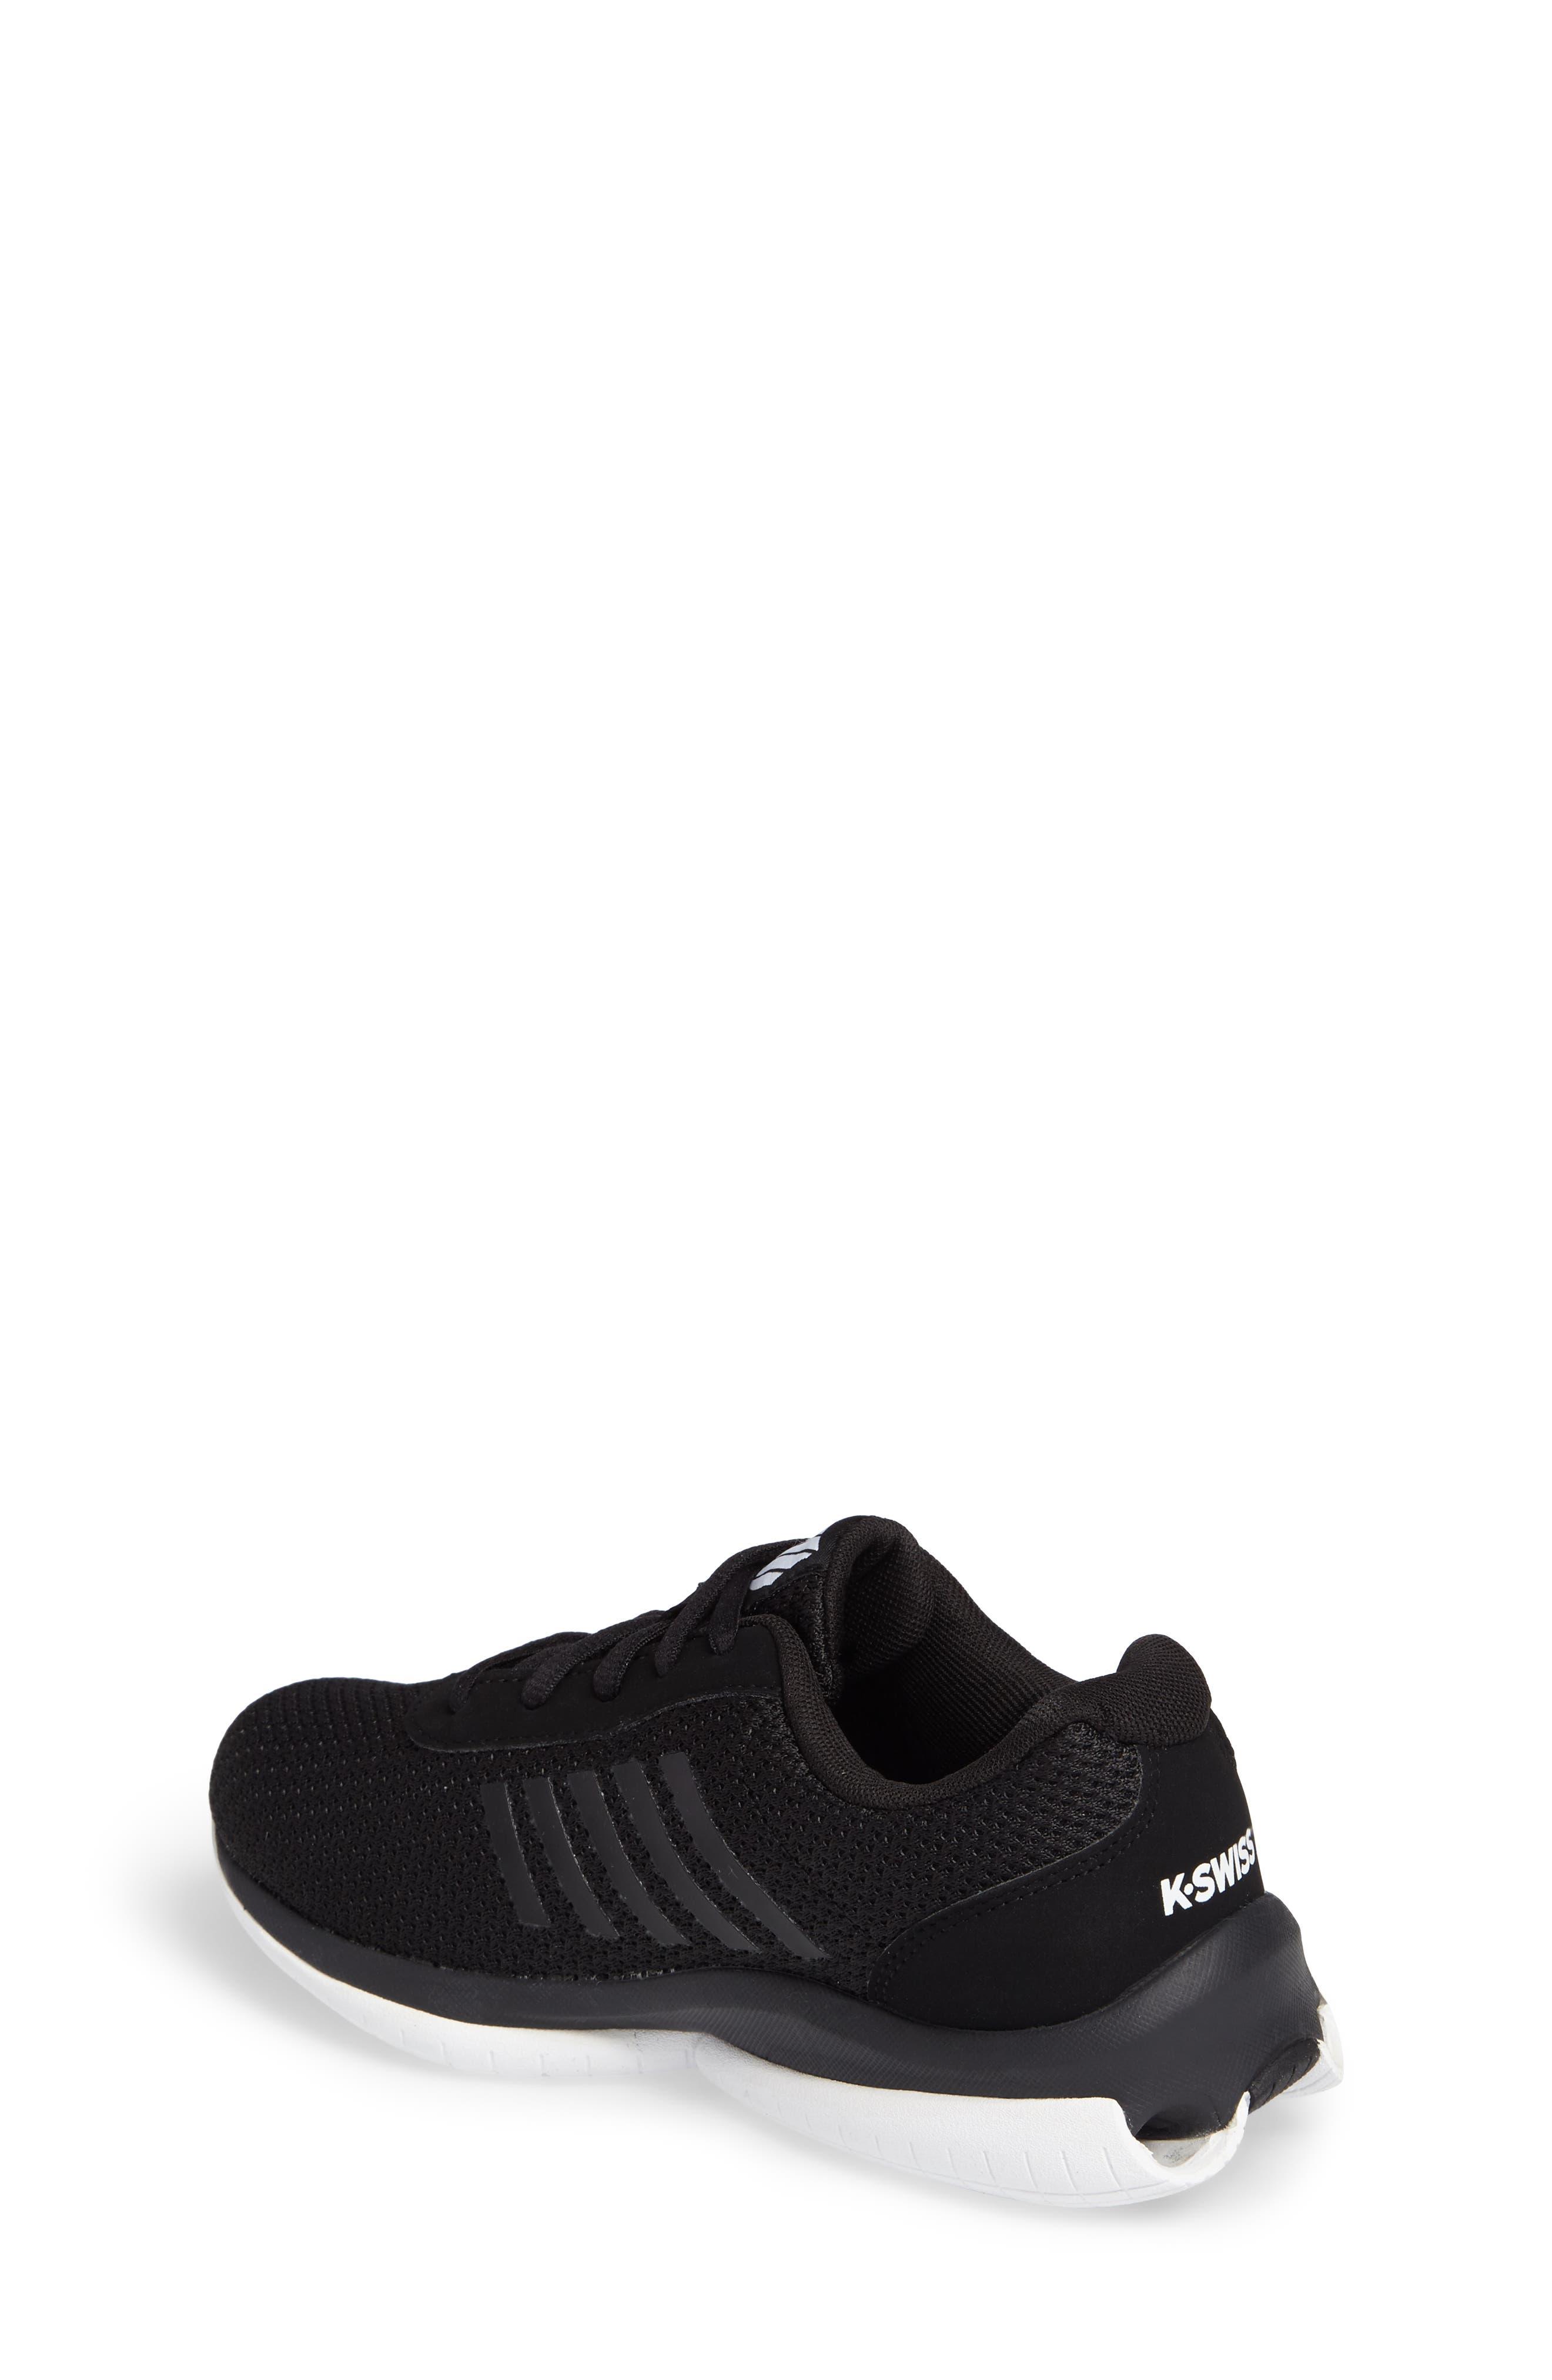 Tubes Infinity Sneaker,                             Alternate thumbnail 2, color,                             002